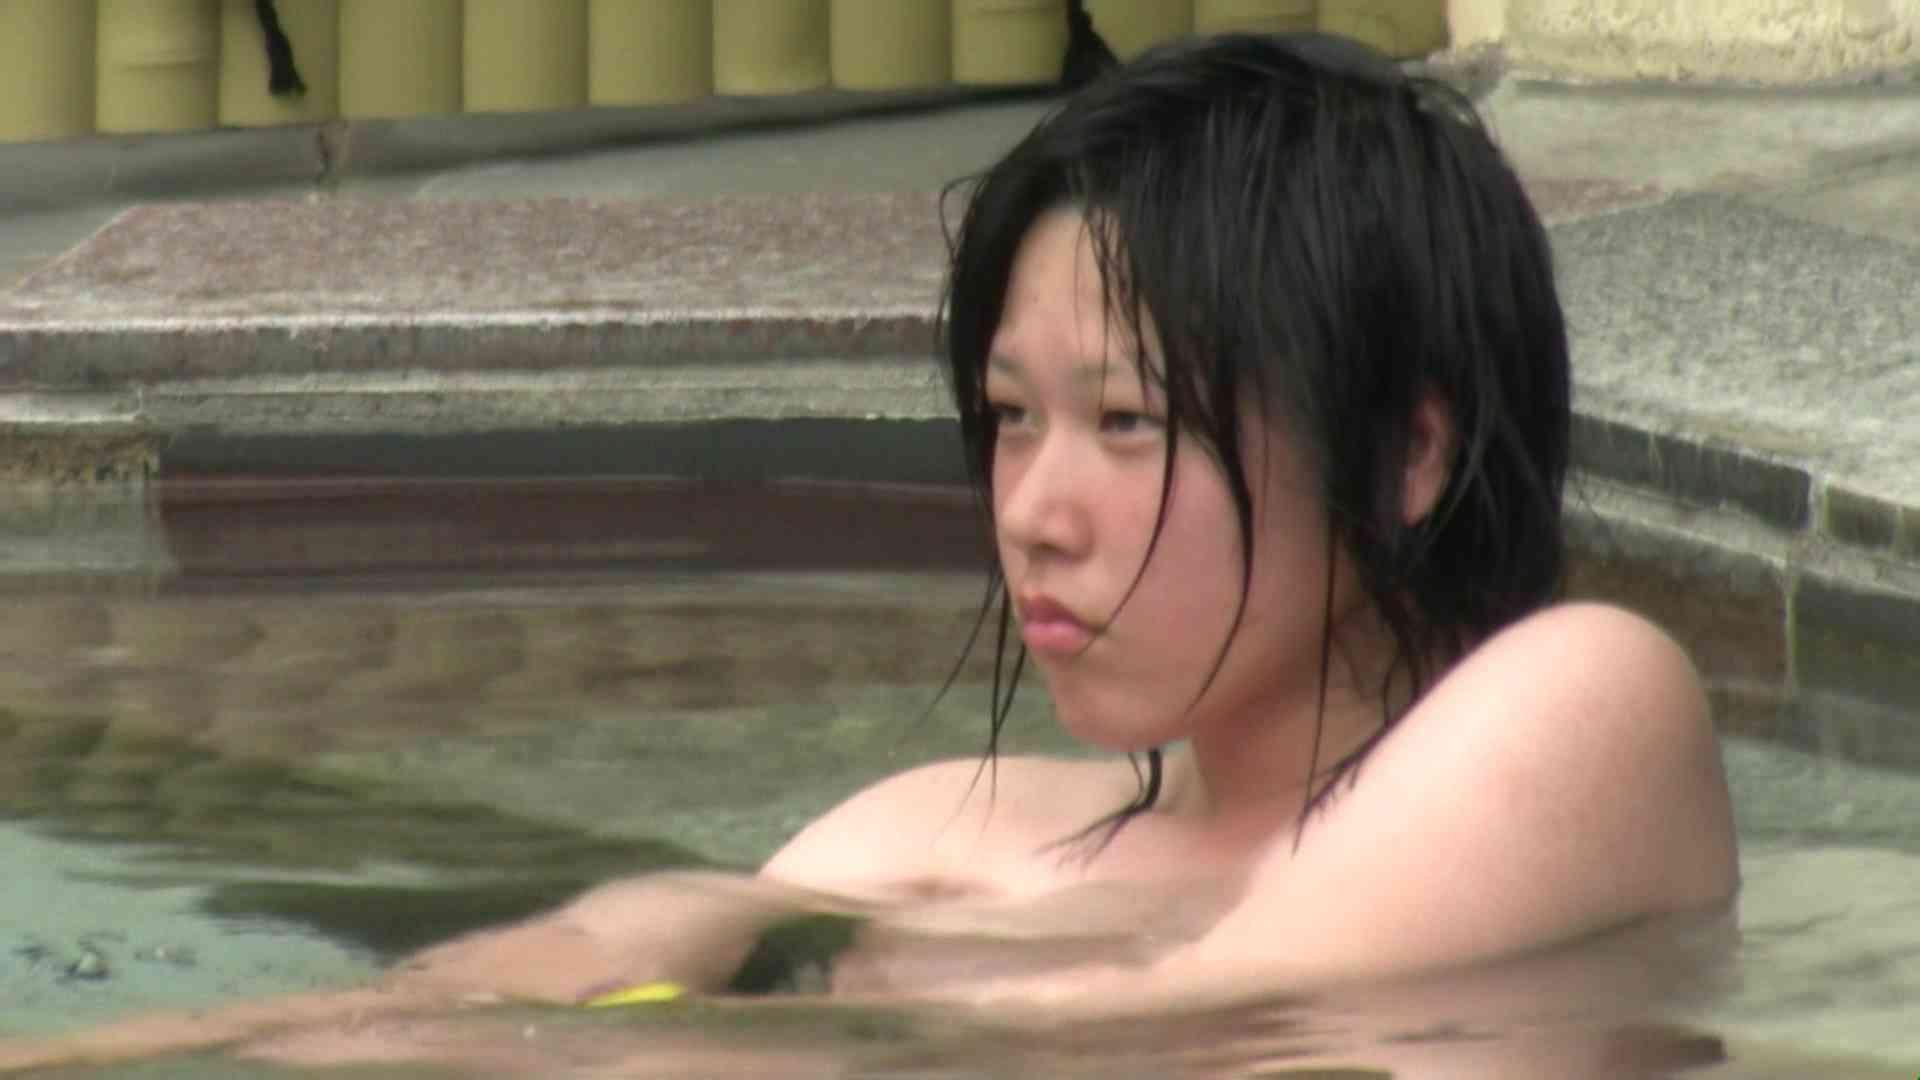 Aquaな露天風呂Vol.36 盗撮シリーズ   露天風呂編  99PIX 91